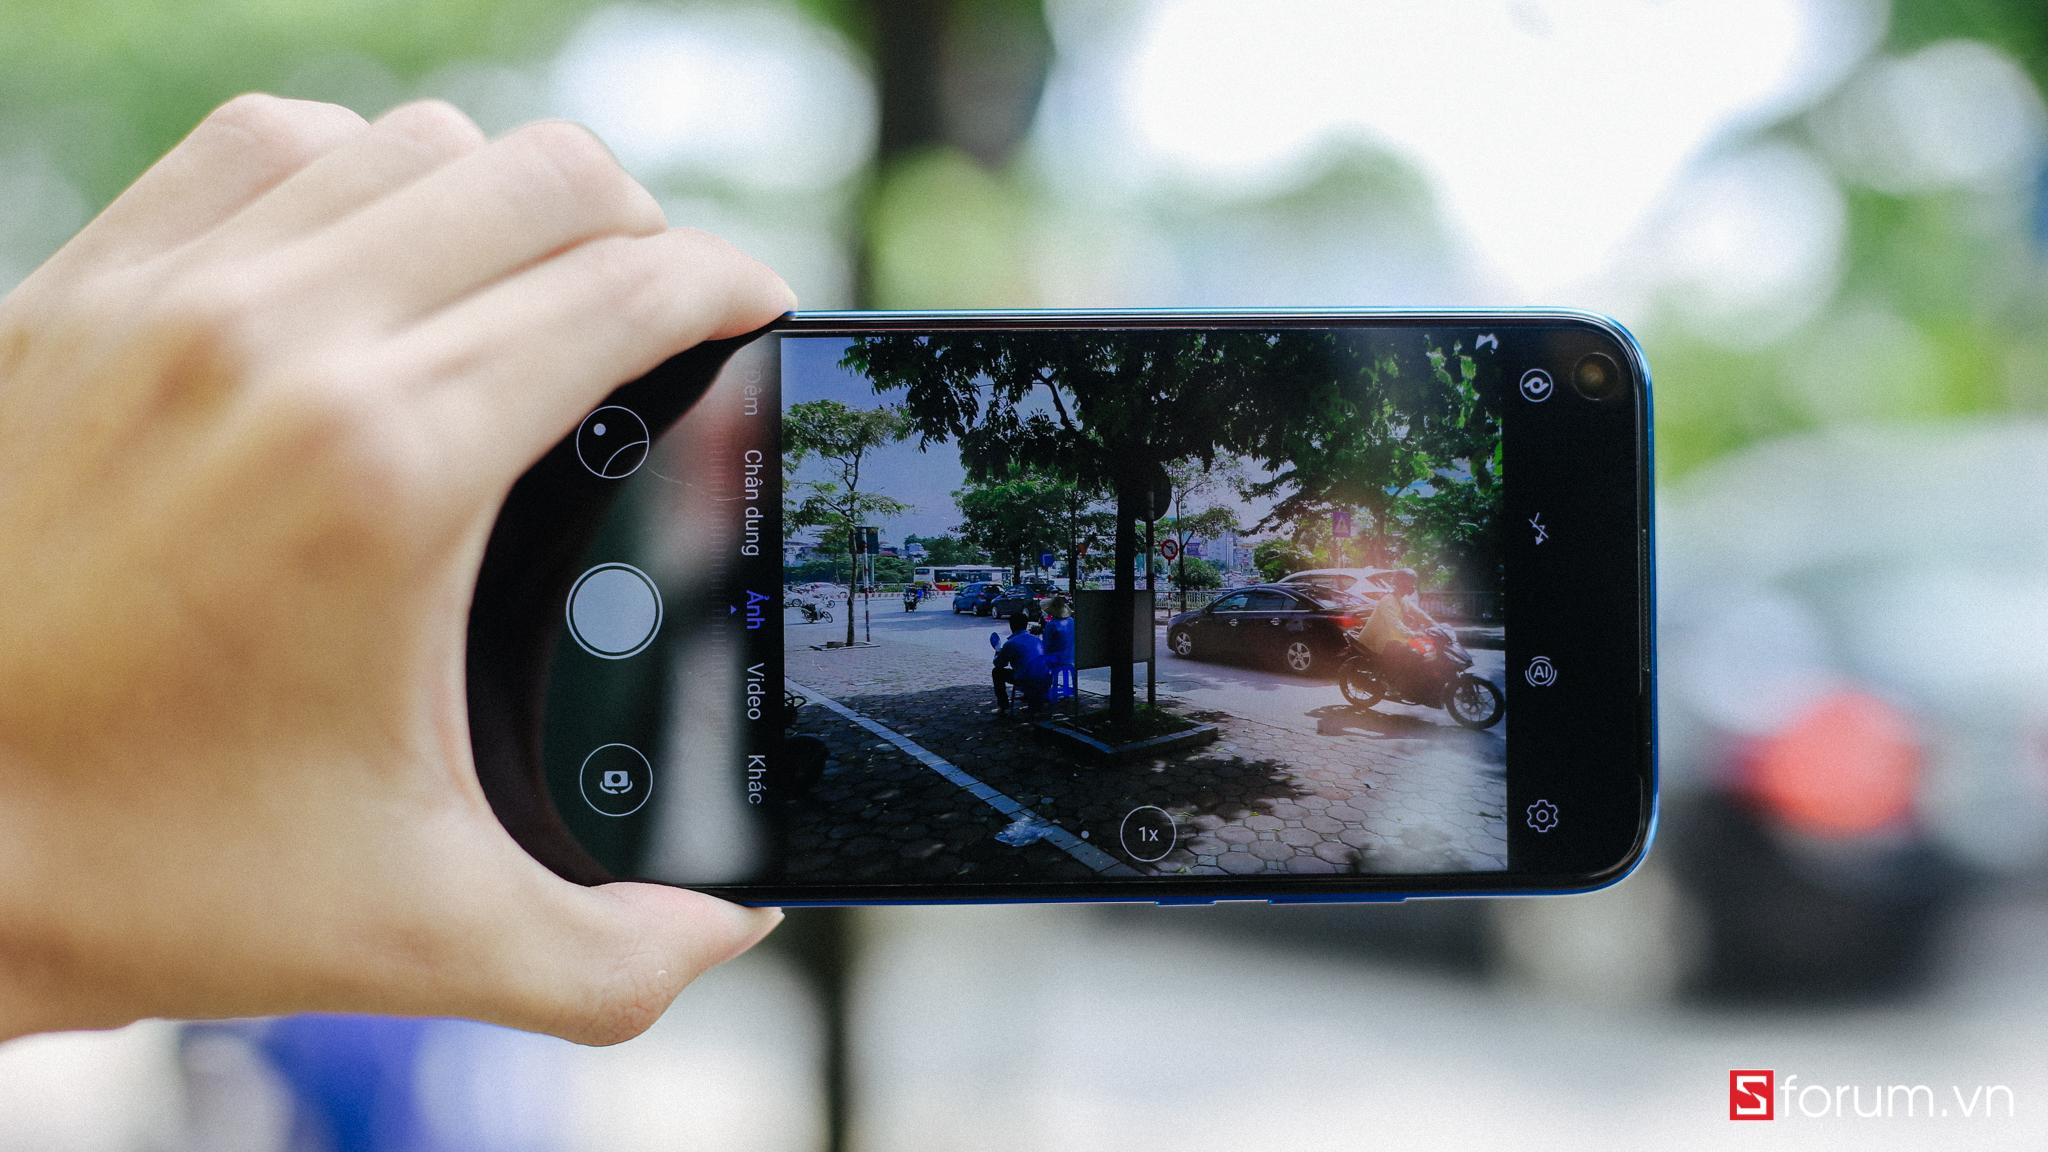 Sforum - Latest technology information page IMG_8669 Huawei Nova 5i on hand in Vietnam: Perforated screen, still using Kirin 710, 4 rear cameras